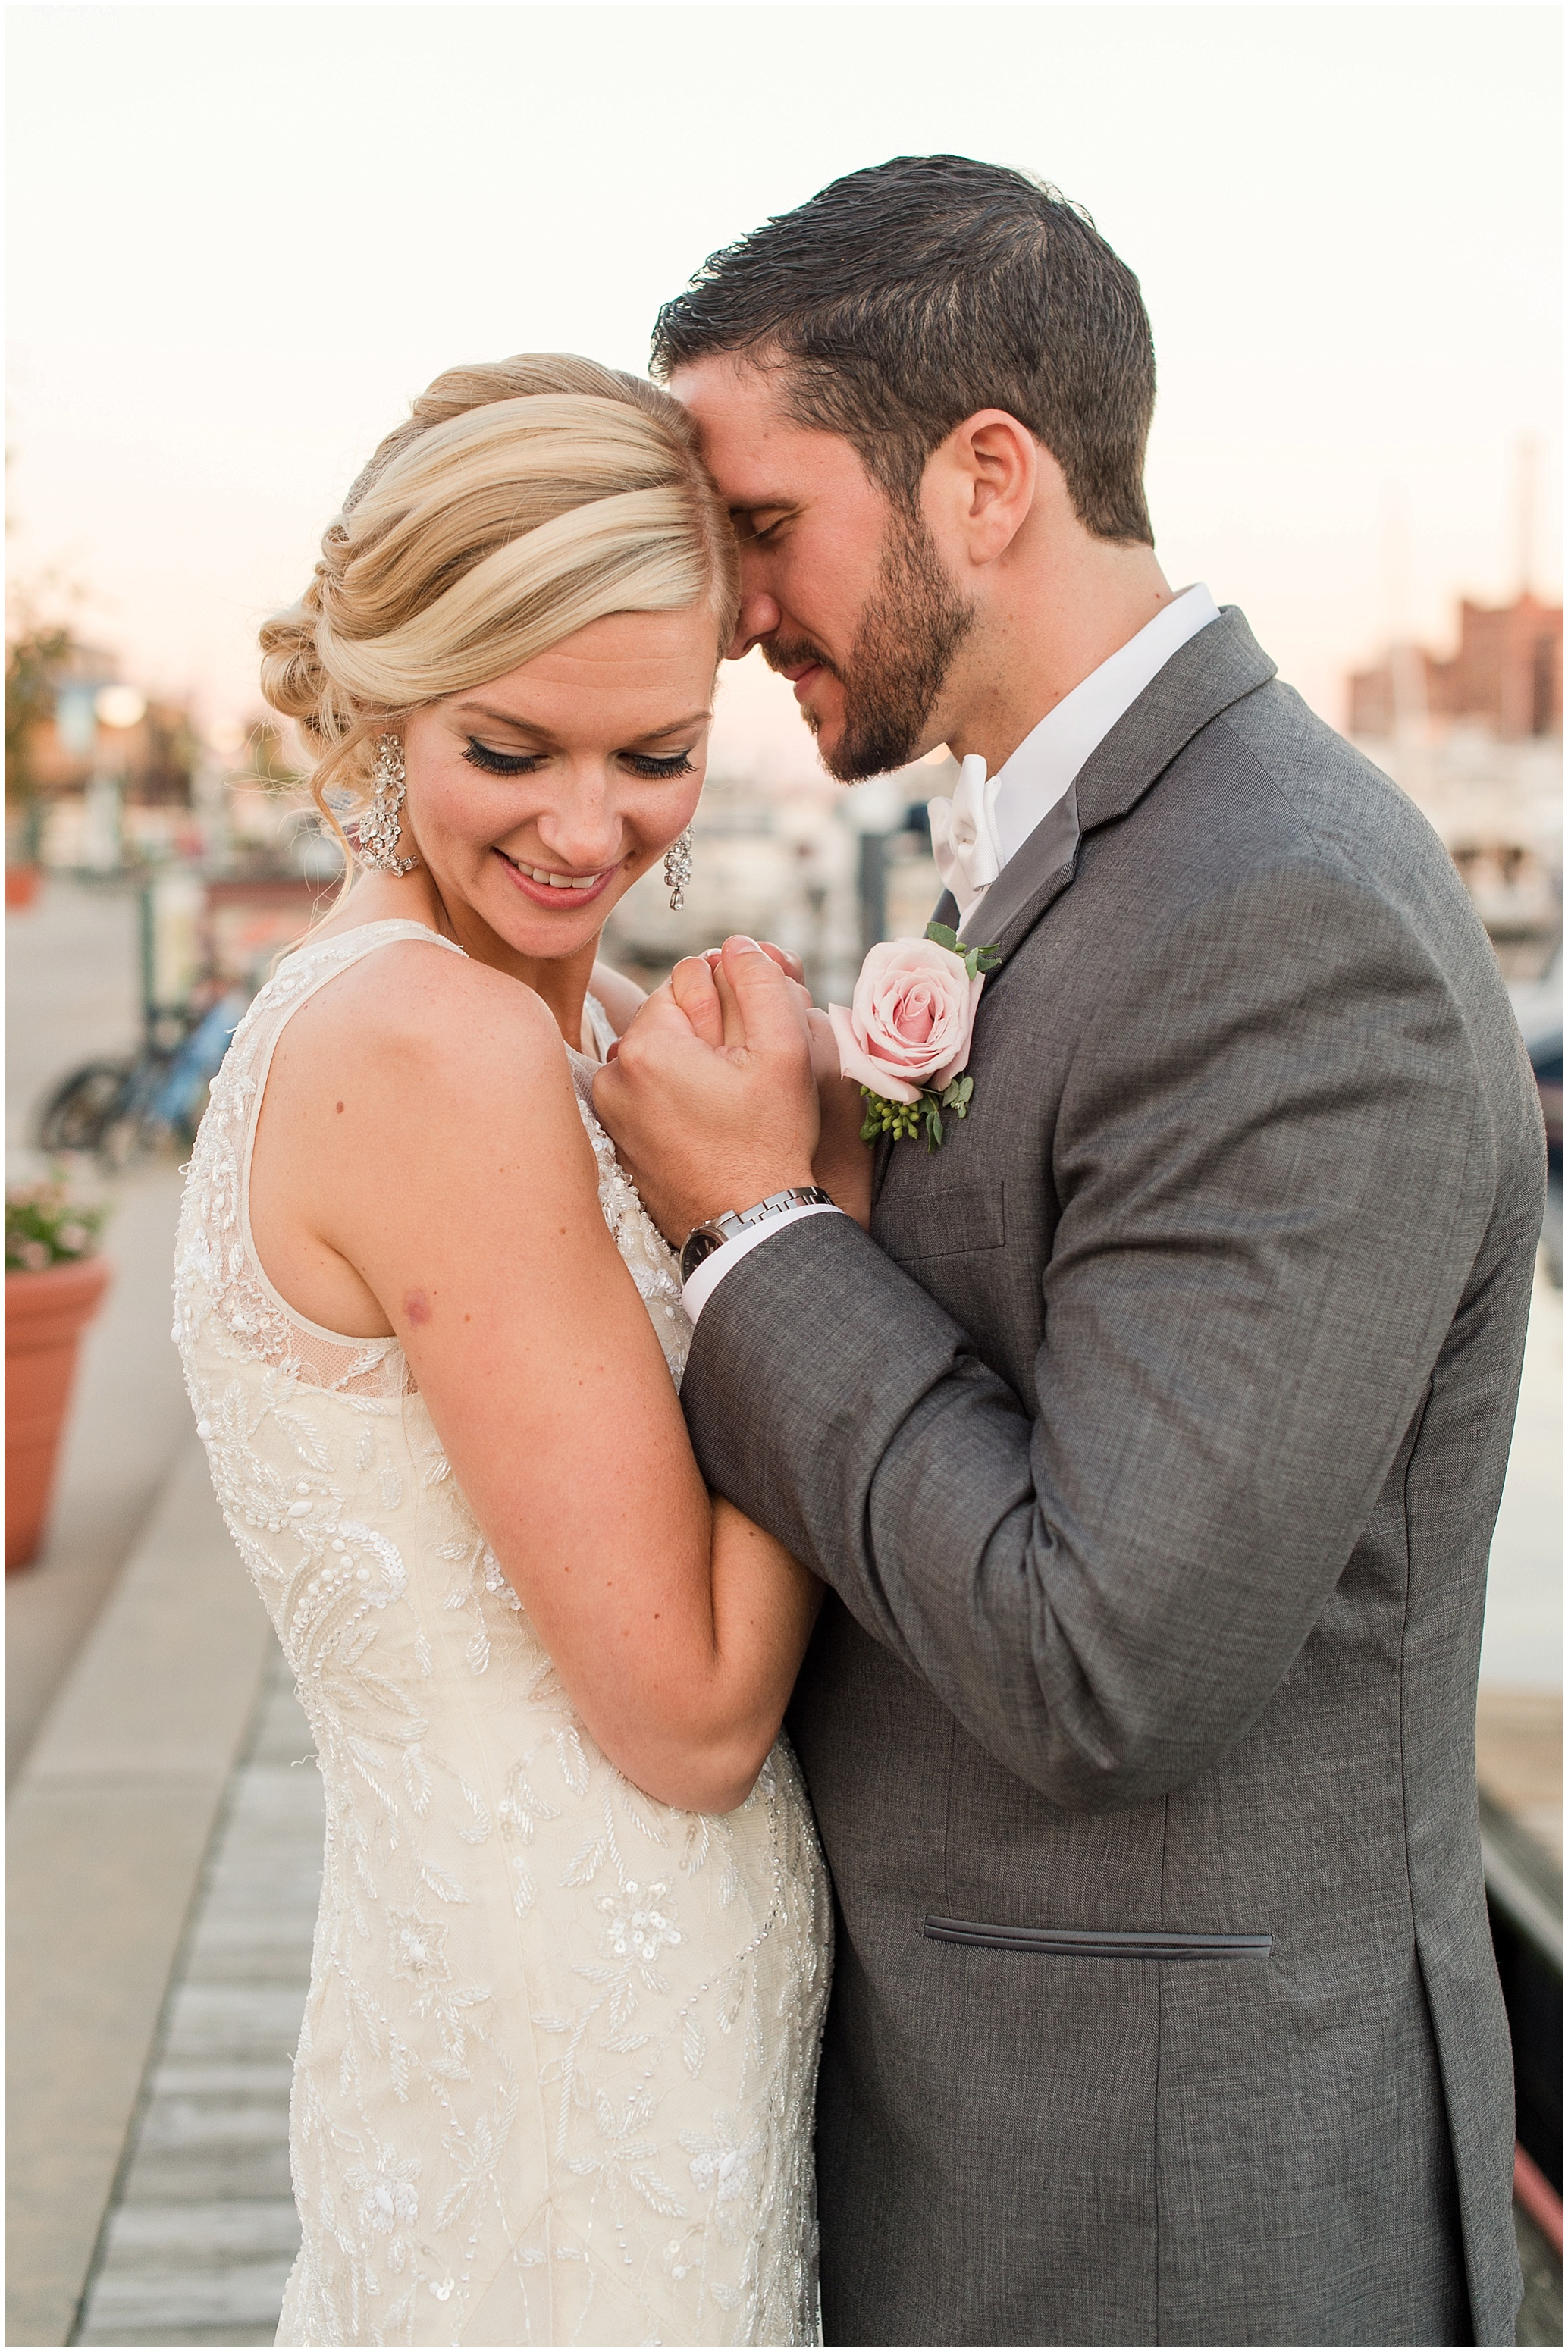 Hannah Leigh Photography Tabrizis Baltimore Wedding_2264.jpg